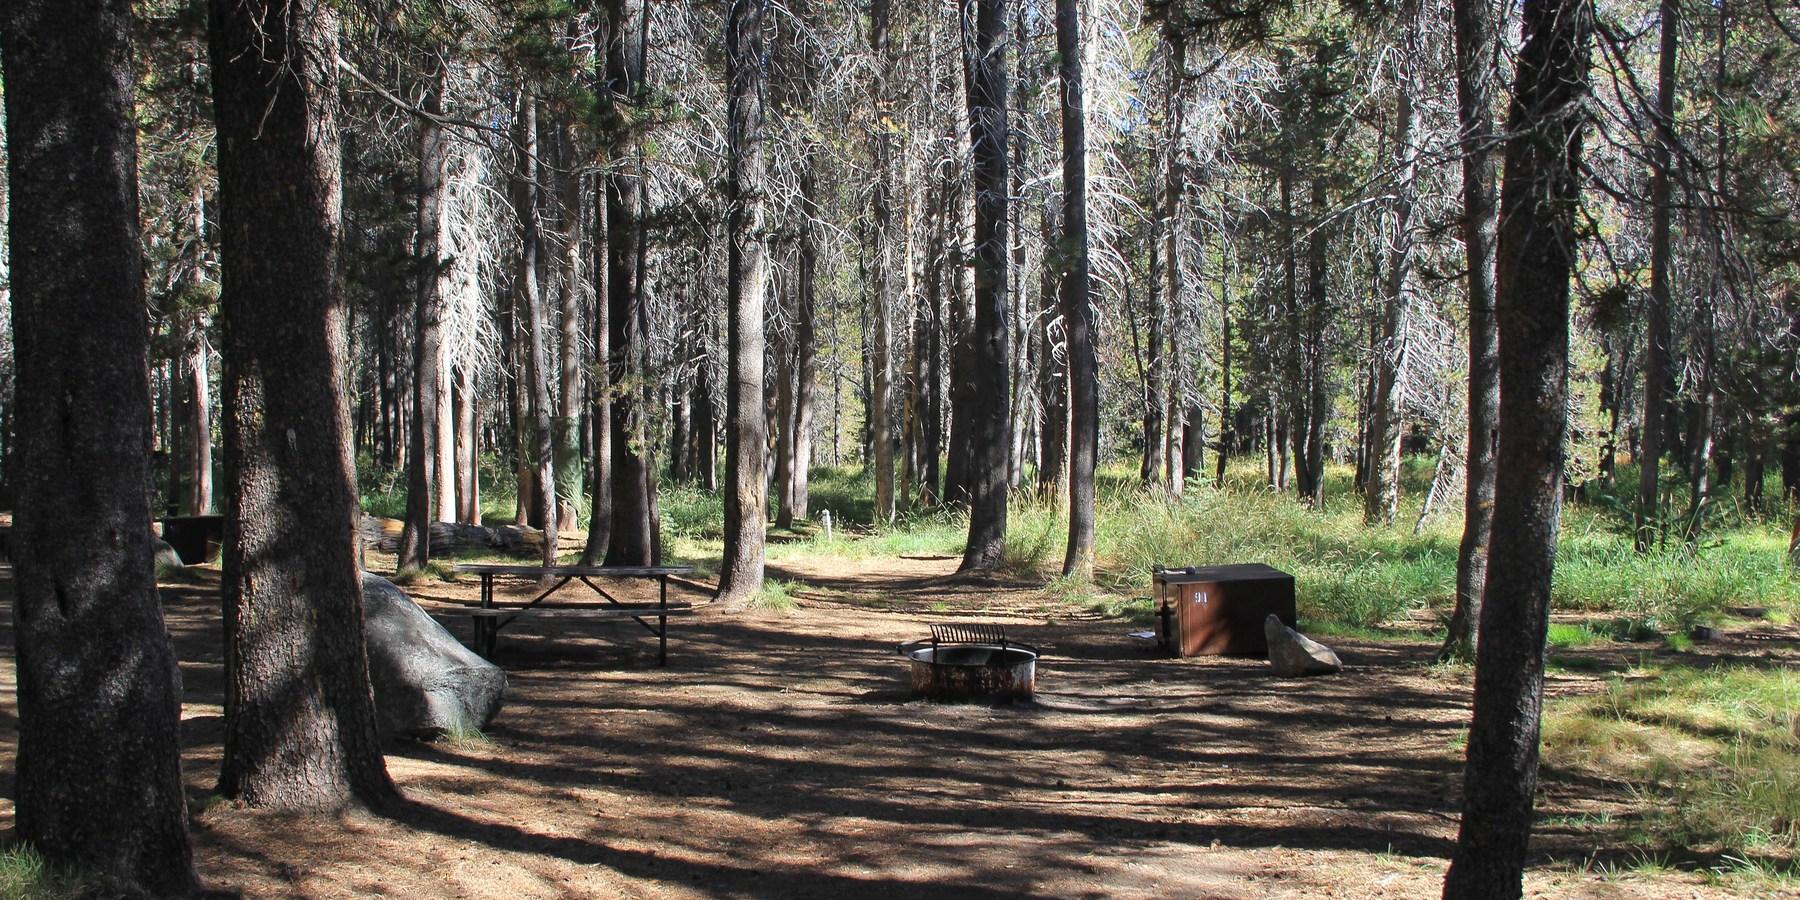 Bridalveil creek campground yosemite national park for Yosemite park camping cabins